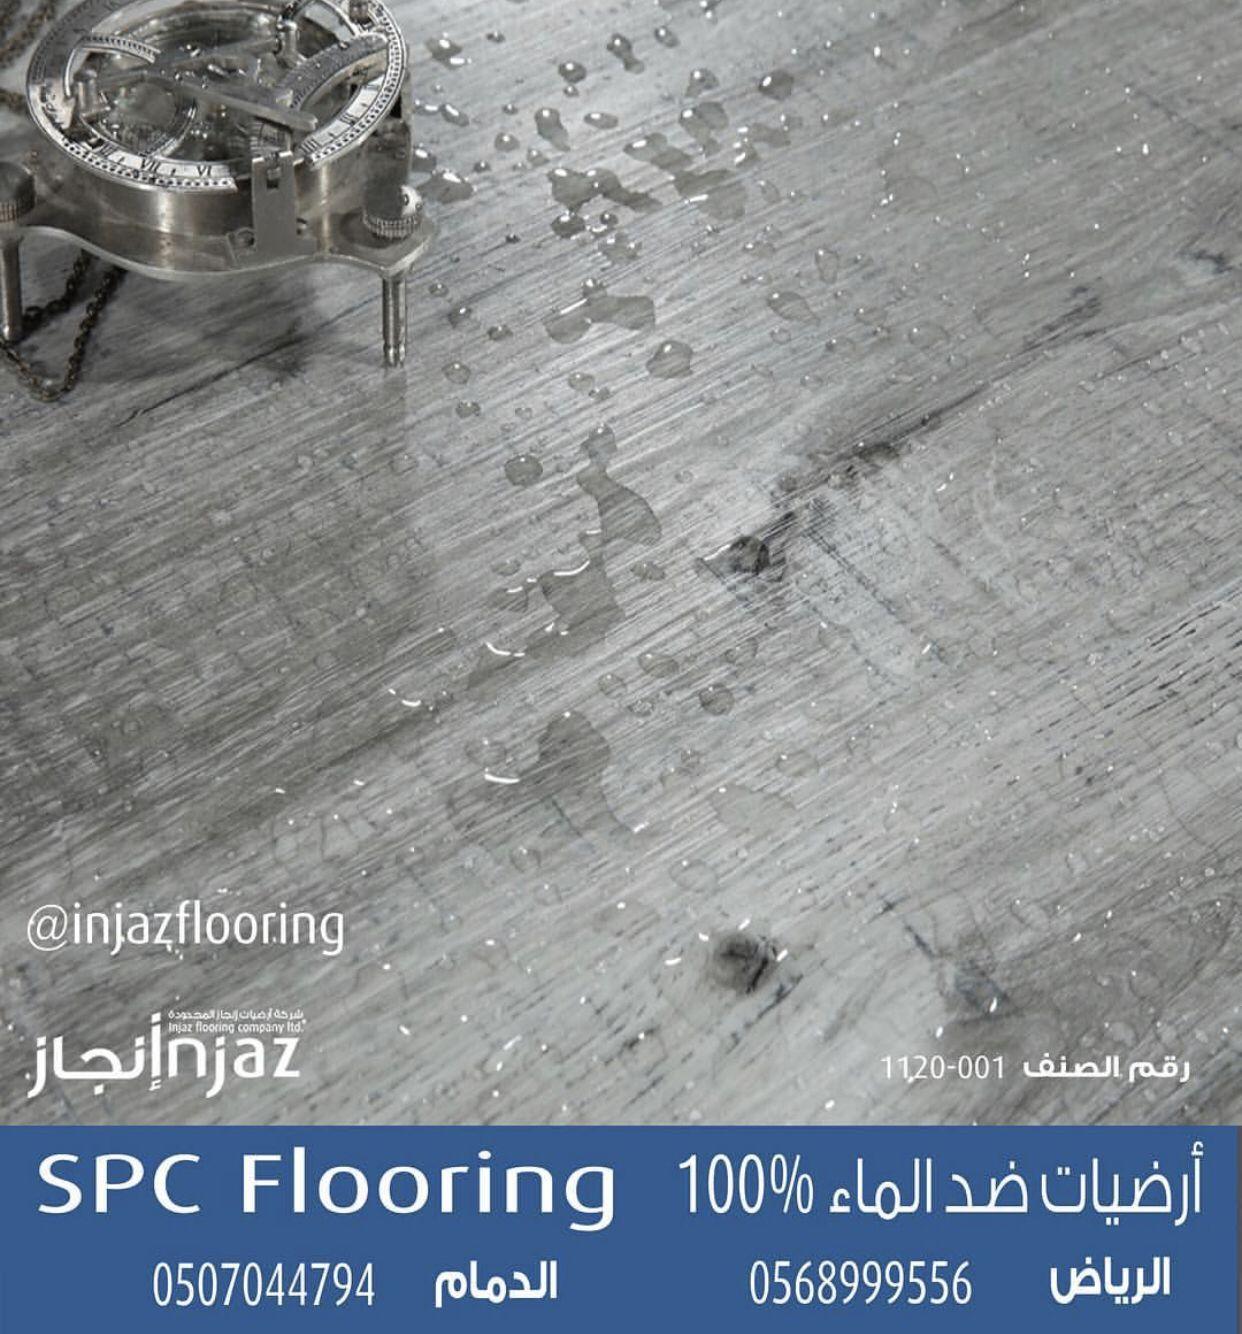 Spc Flooring ارضيات ضد الماء Outdoor